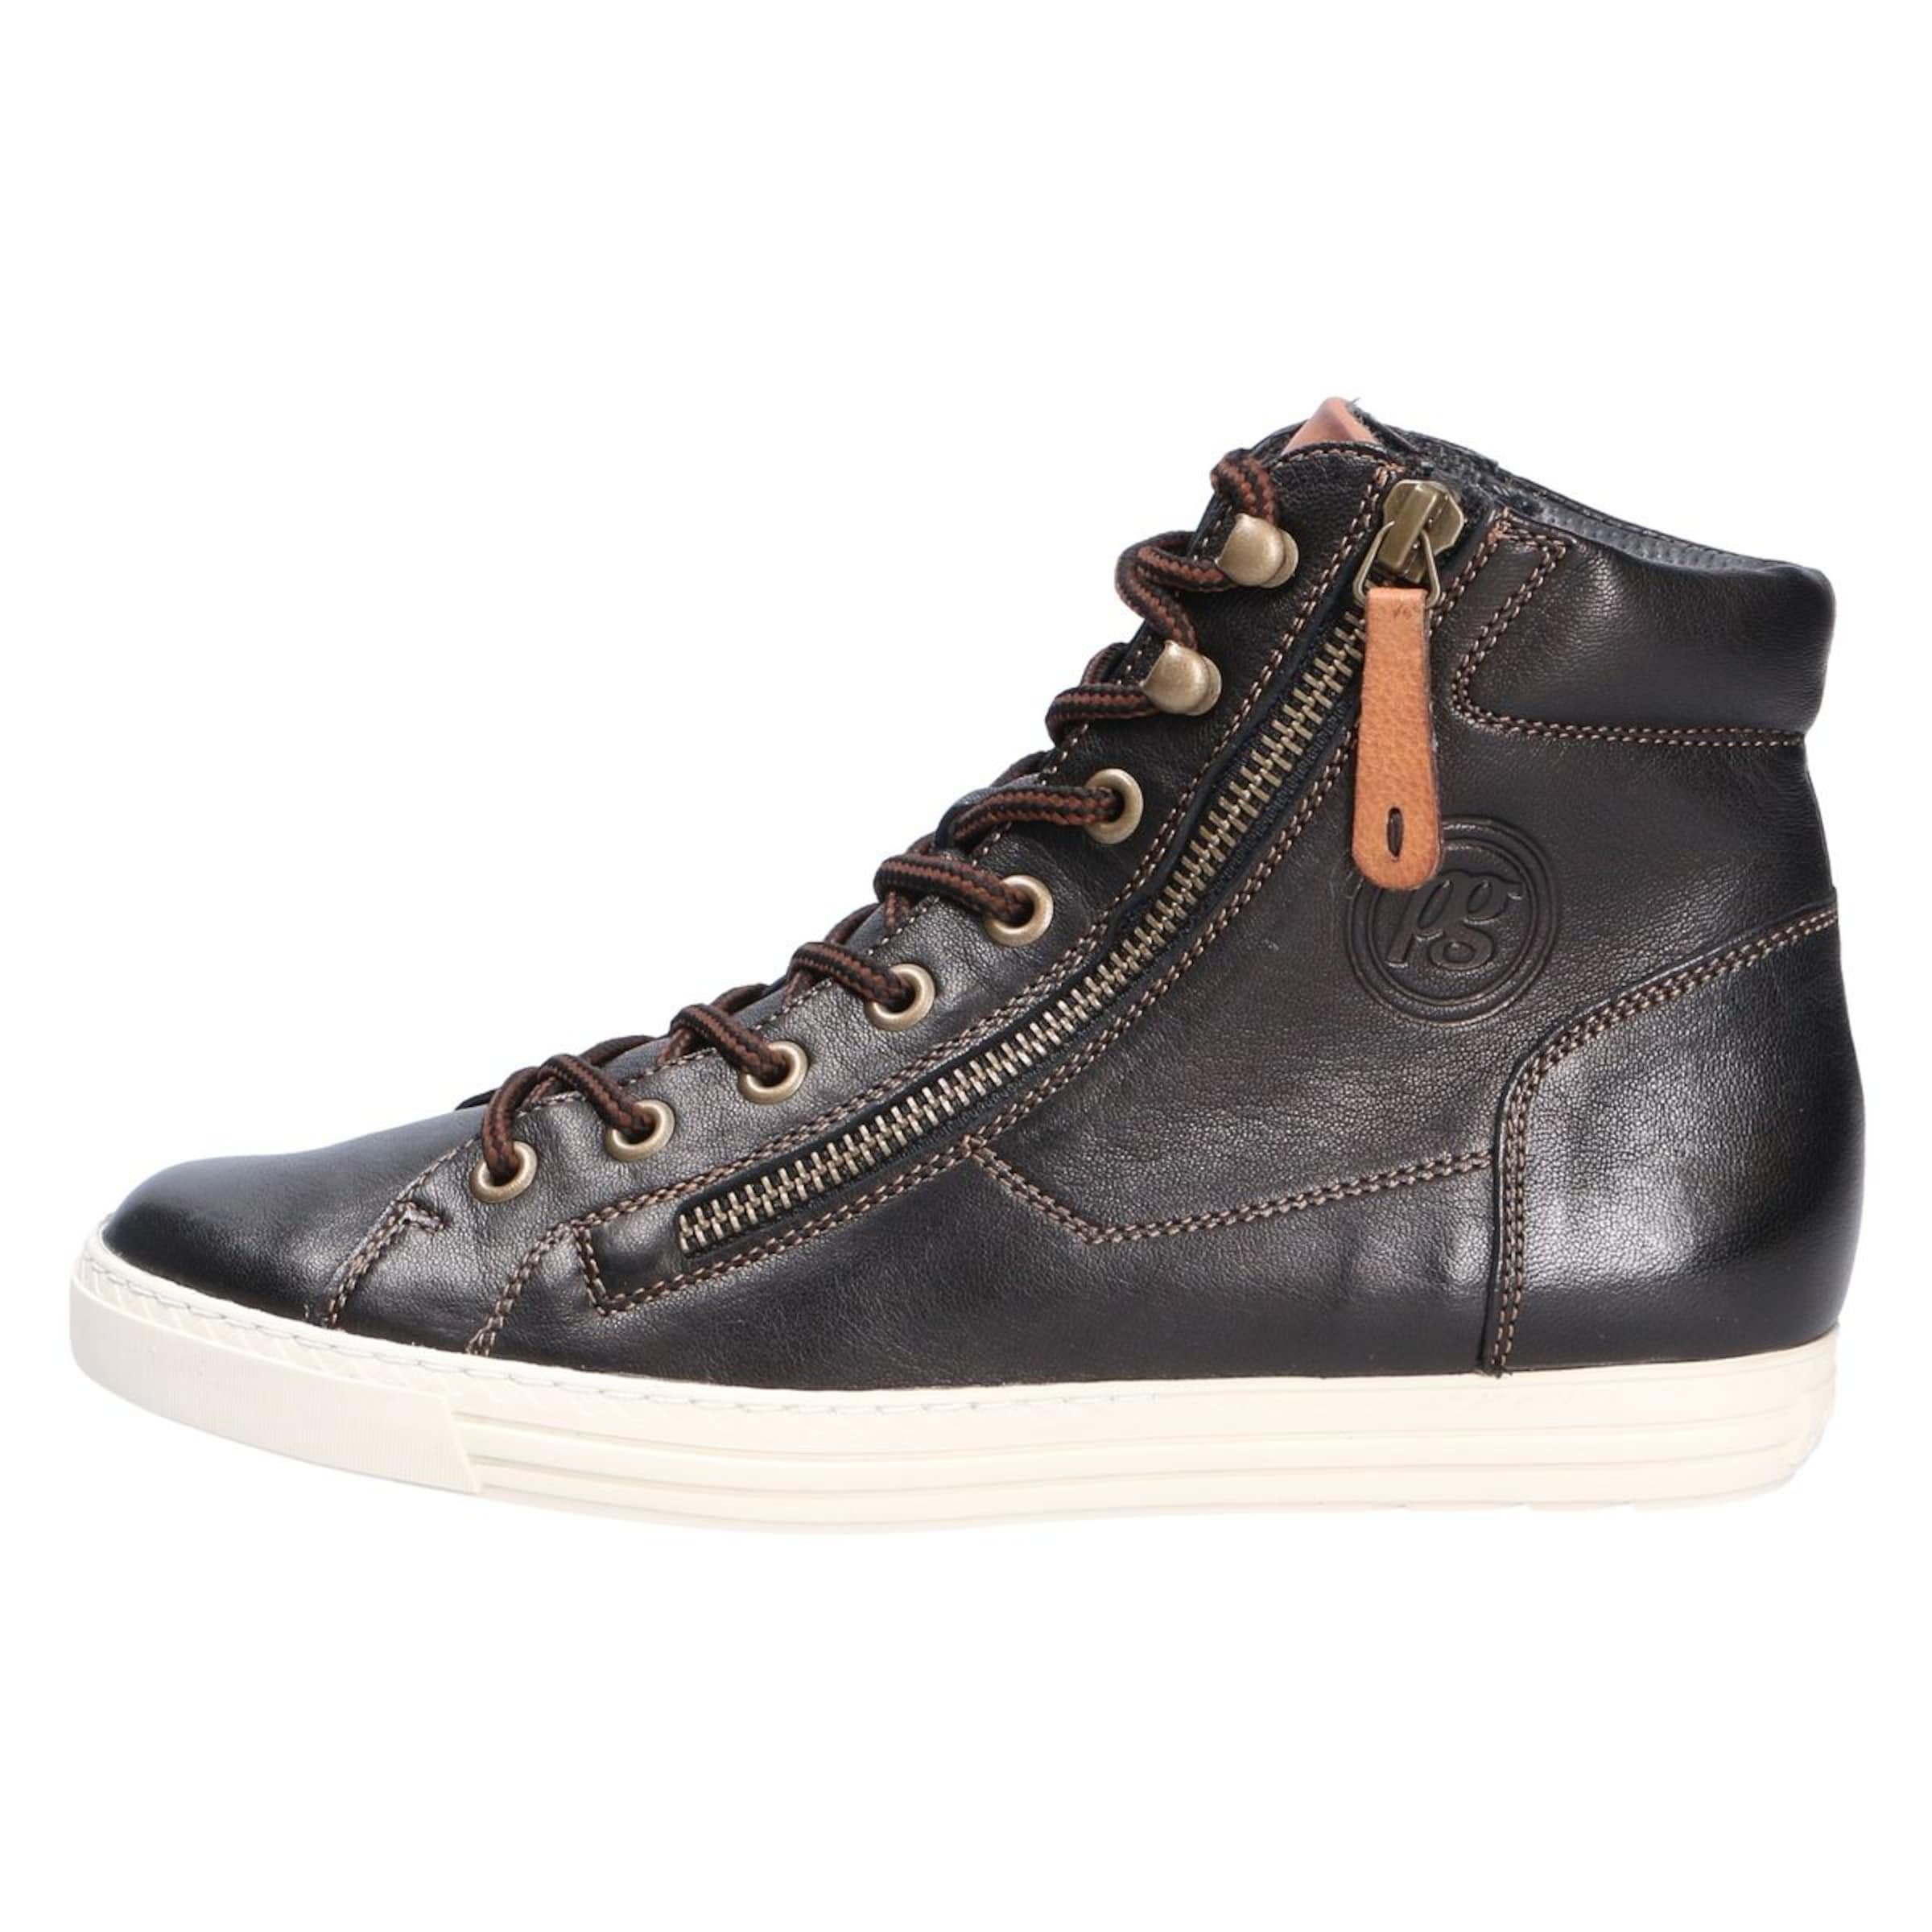 Offwhite Paul Green Sneakers In BraunSchwarz ZiuTPOkX